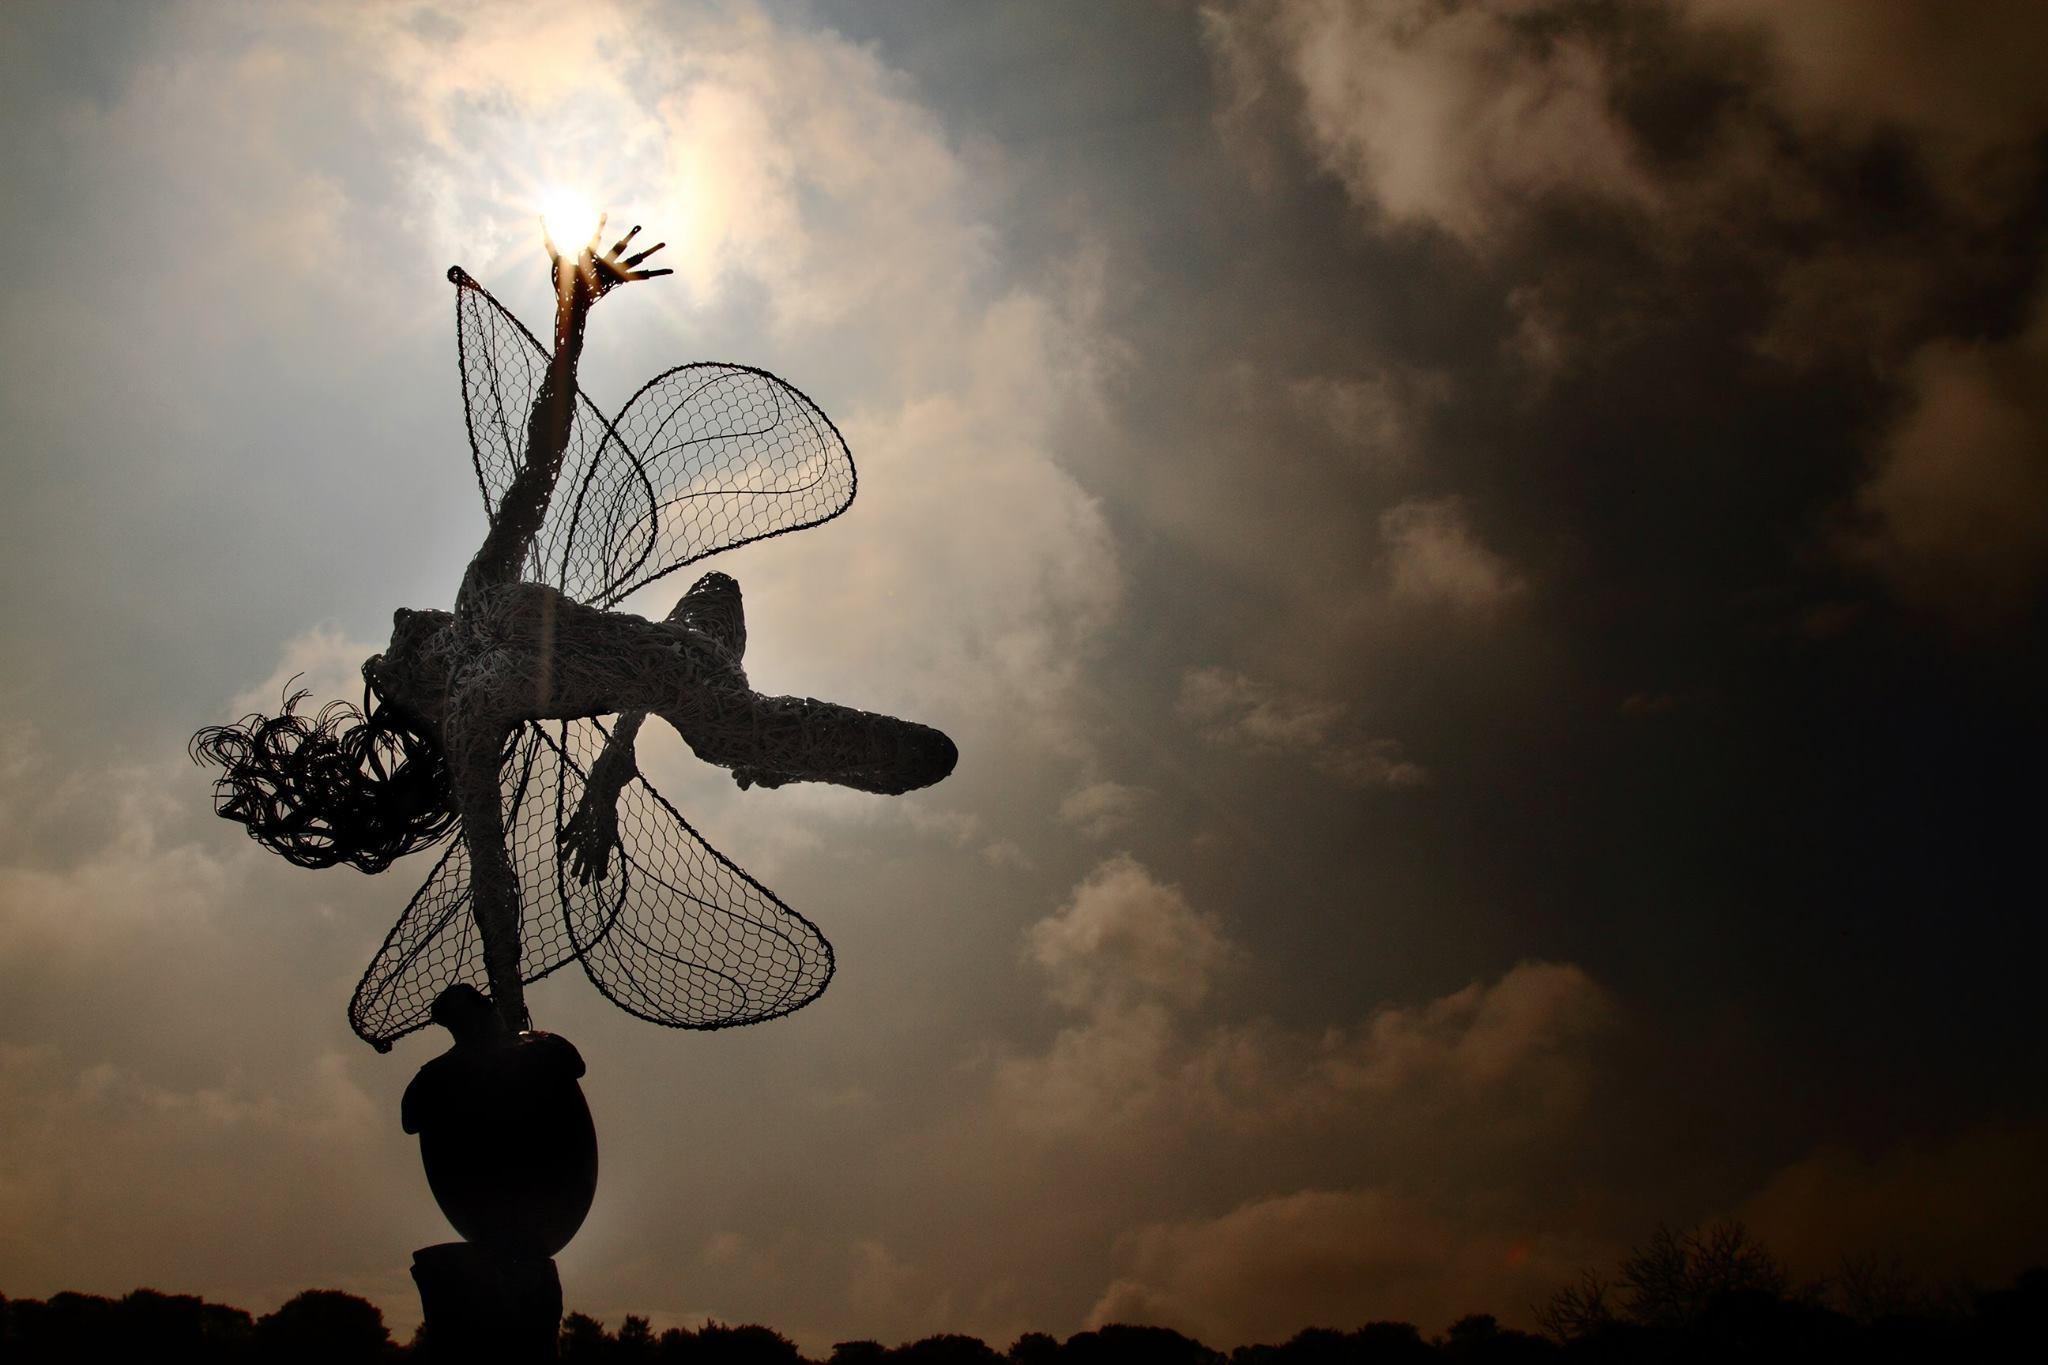 esculturas-fantasticas-de-robin-wight-19